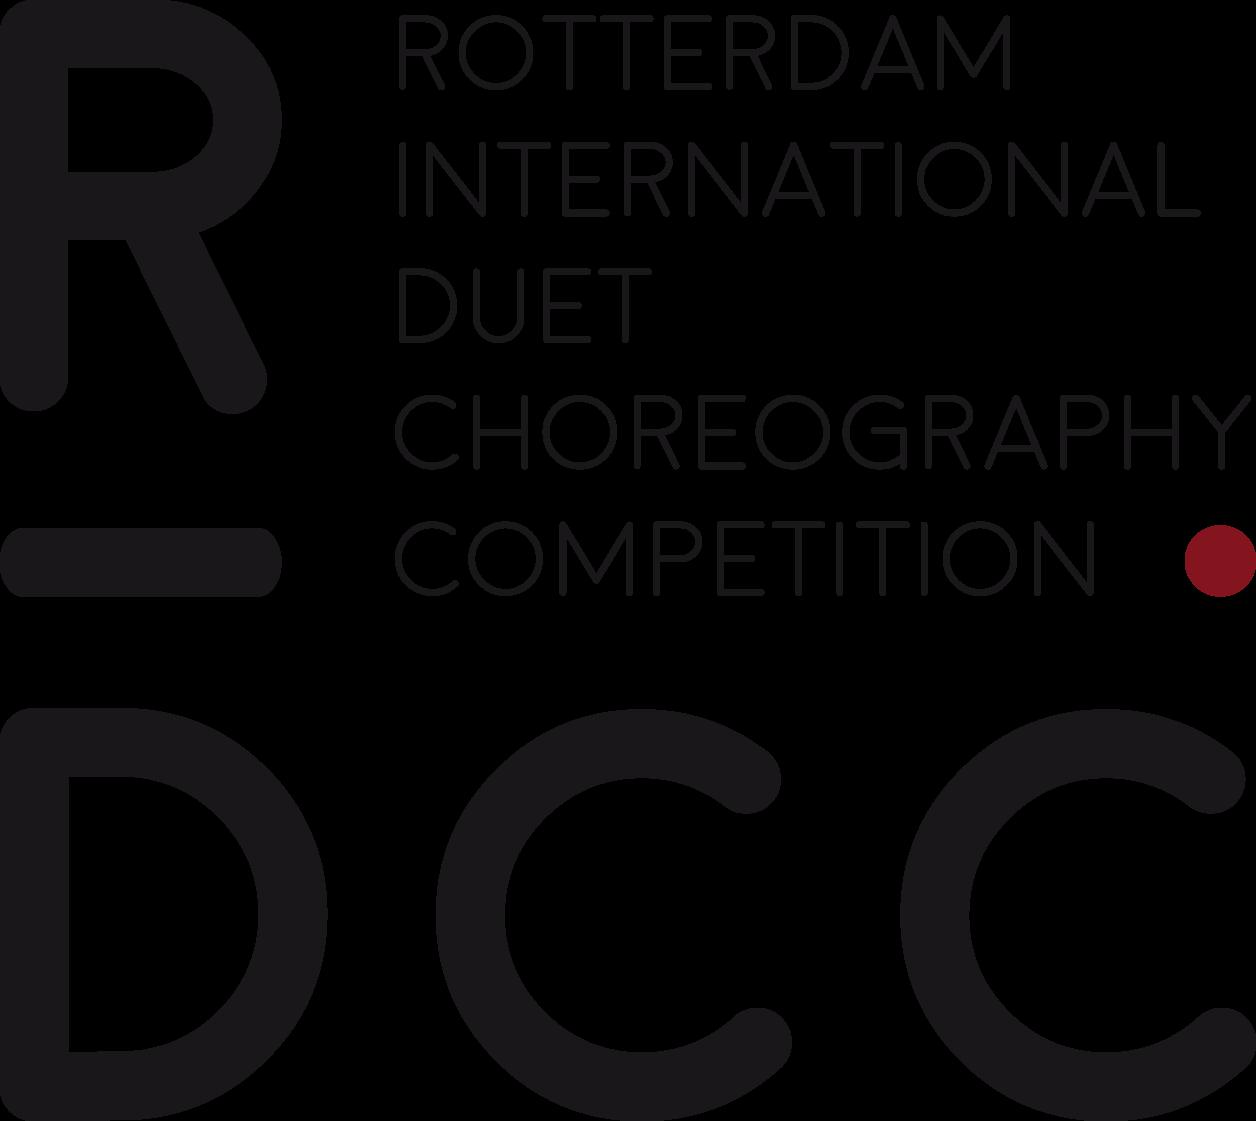 Rotterdam International Duet Choreography Competition